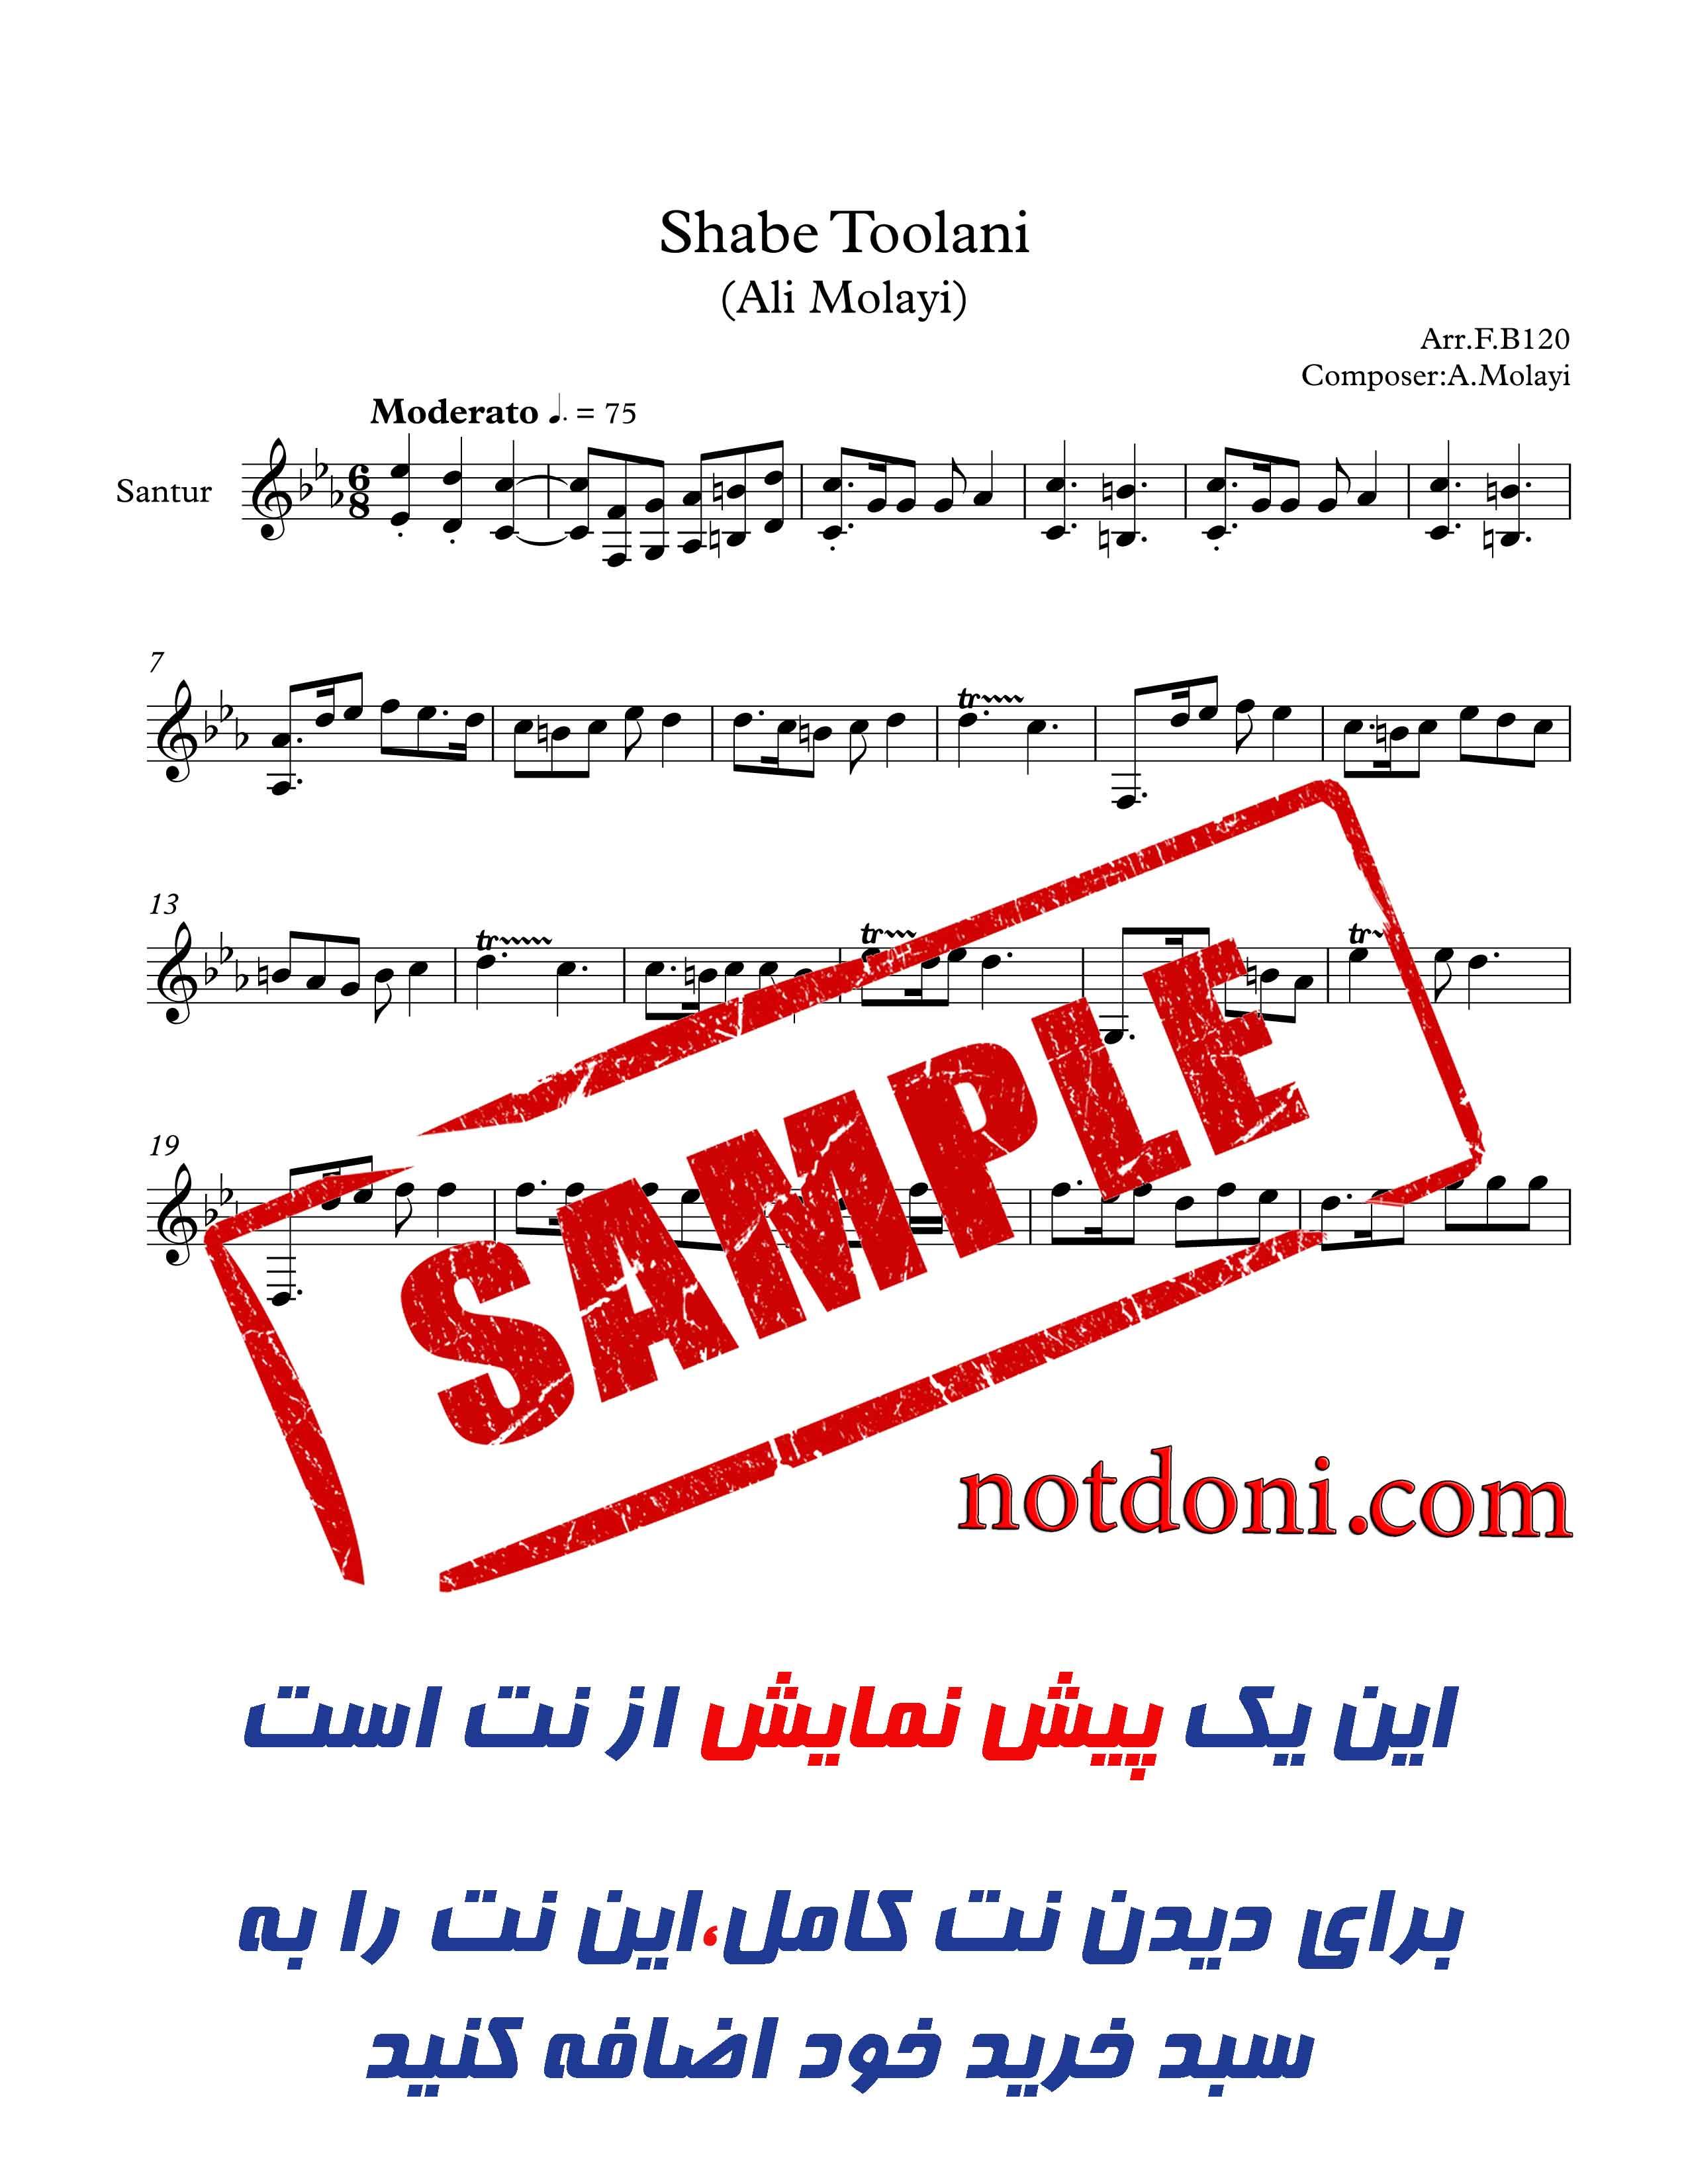 85dcf55f-2df7-4d17-9eac-95cbfc86742b_Santoor-Shabe-Toolani(Ali-Molayi).jpg